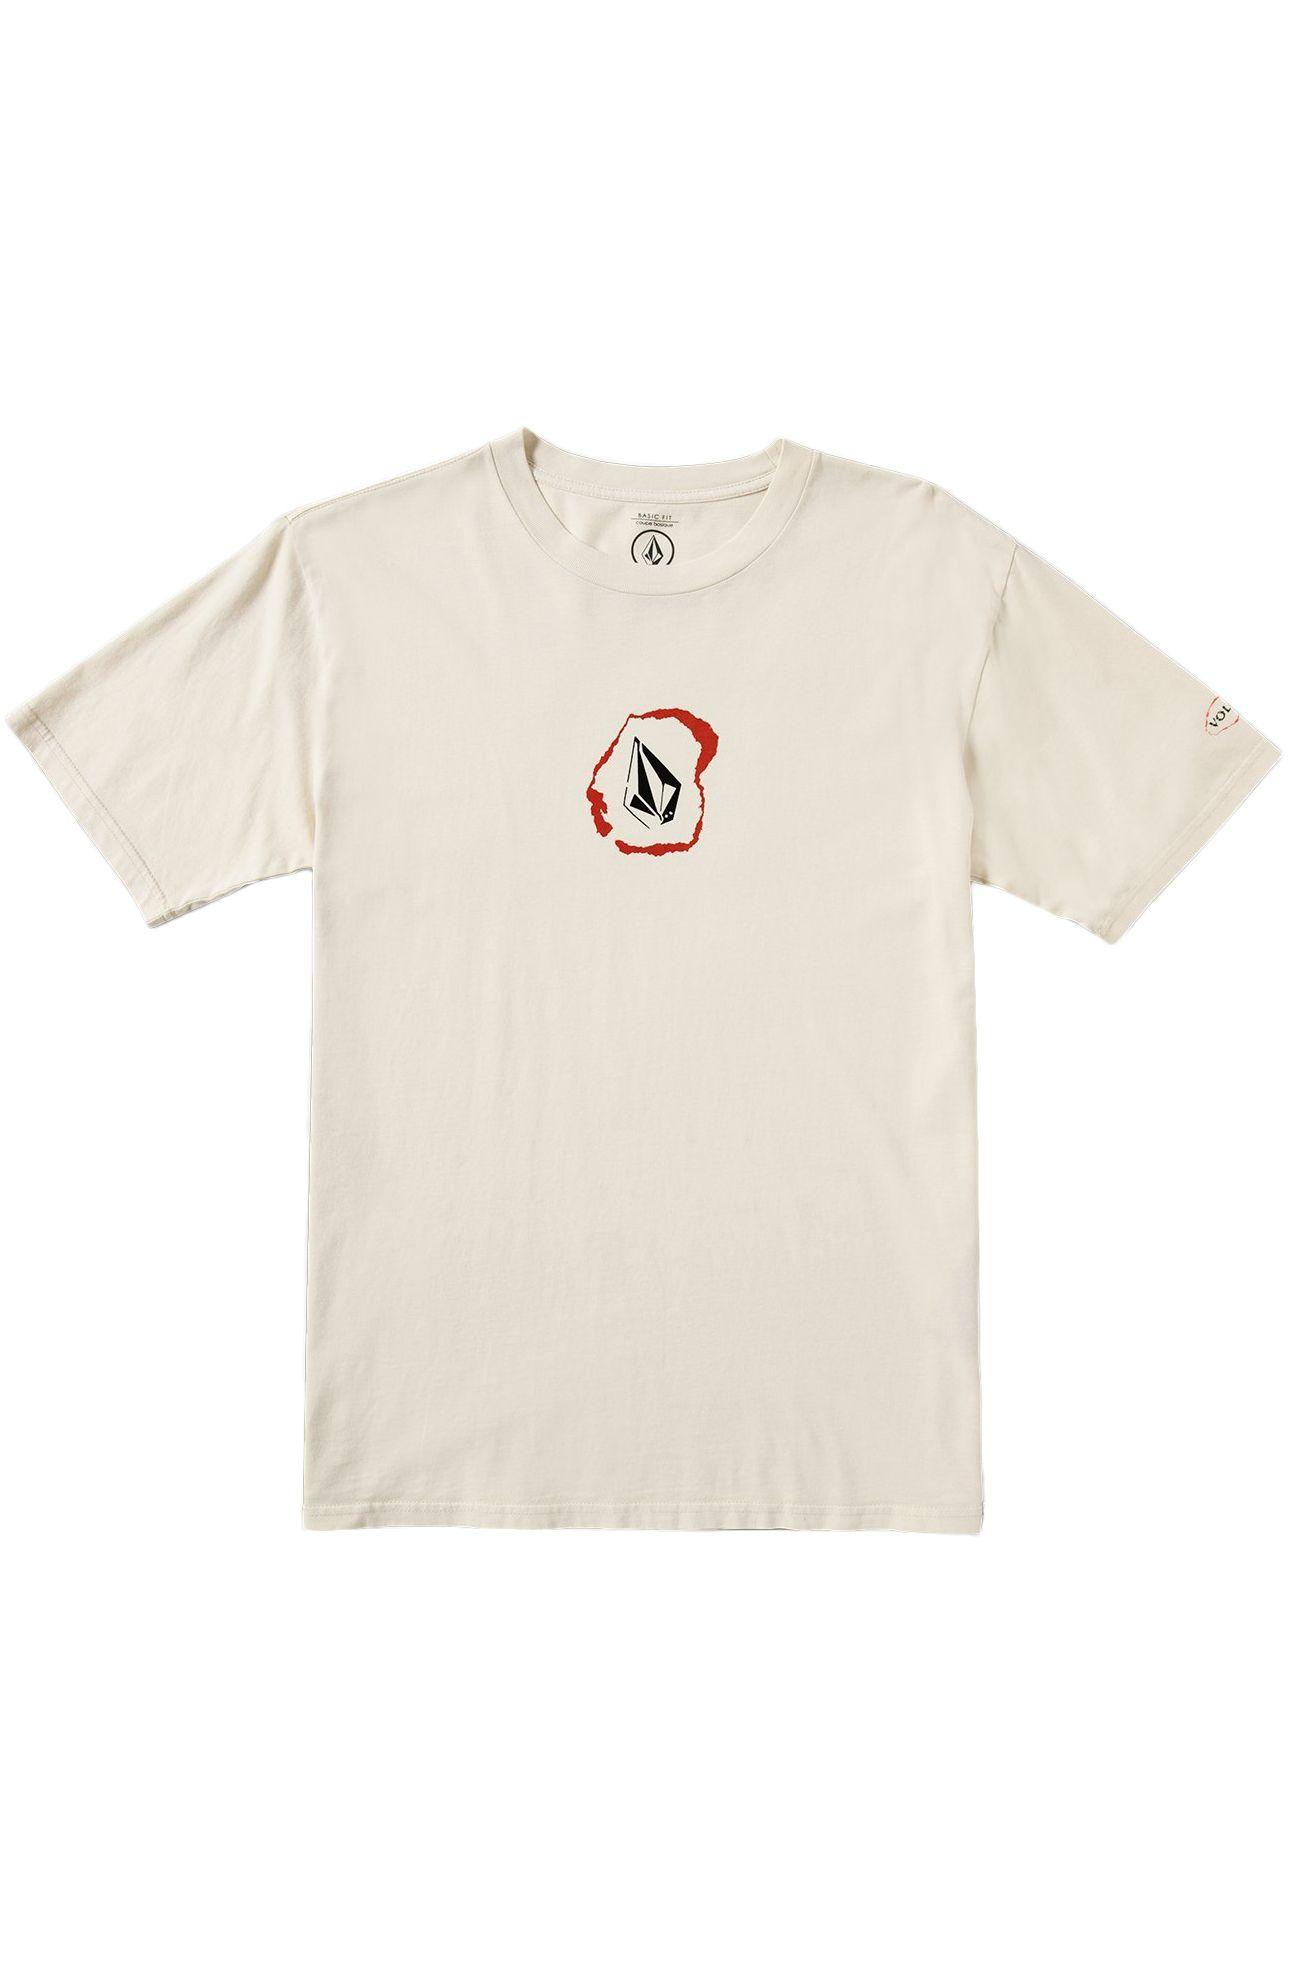 Volcom T-Shirt POSTED White Flash